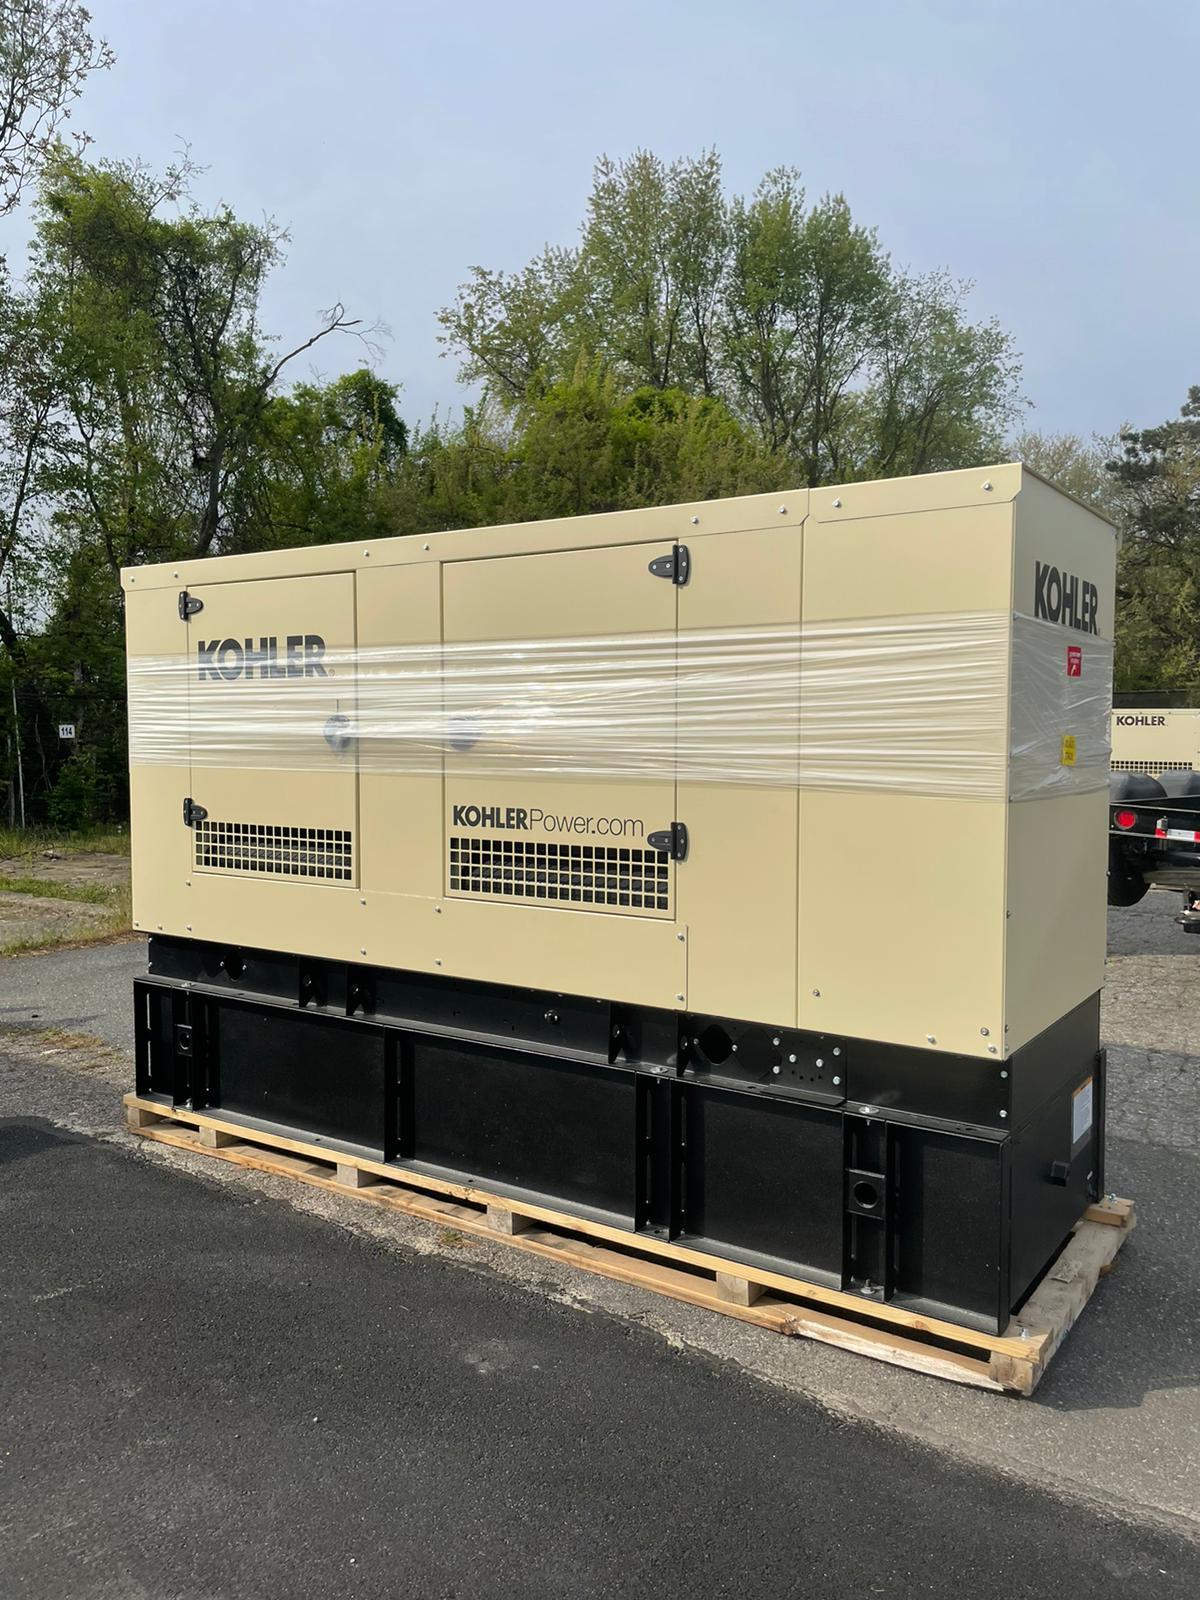 New 150 kW Kohler 150REOZJF Diesel Generator – EPA Tier 3 – 5 AVAILABLE – COMING IN!